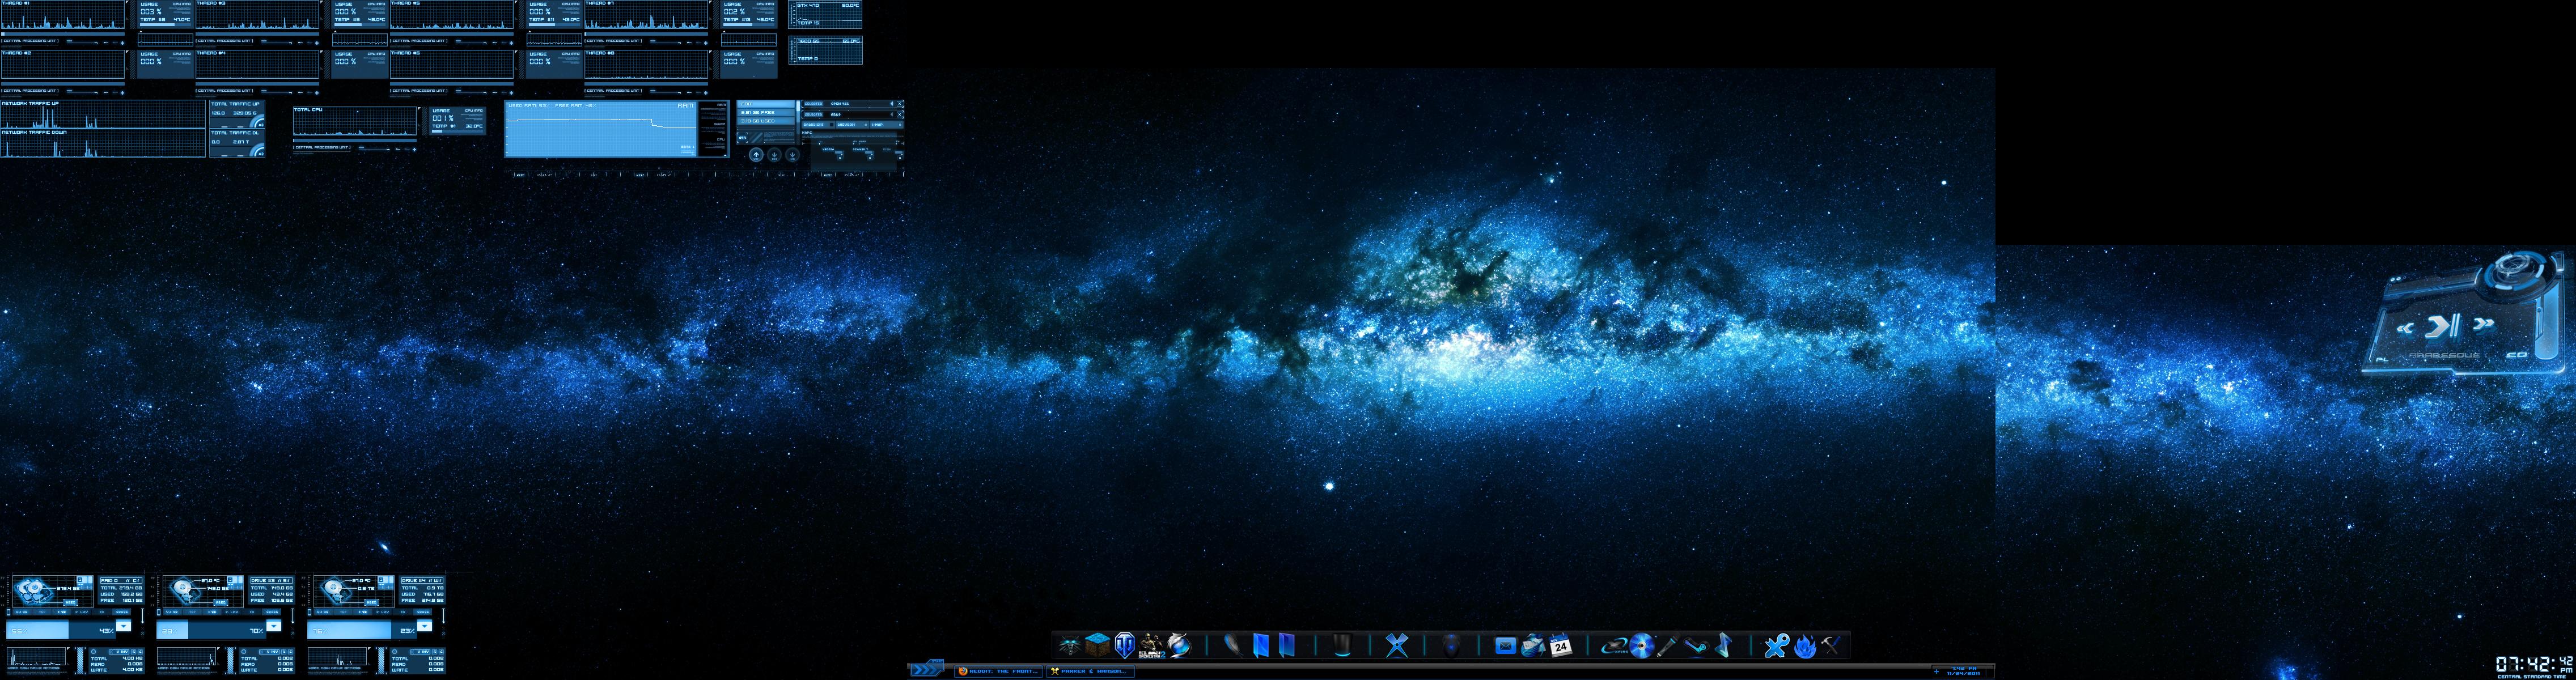 Desktop 11-24-11 by ChewySolo